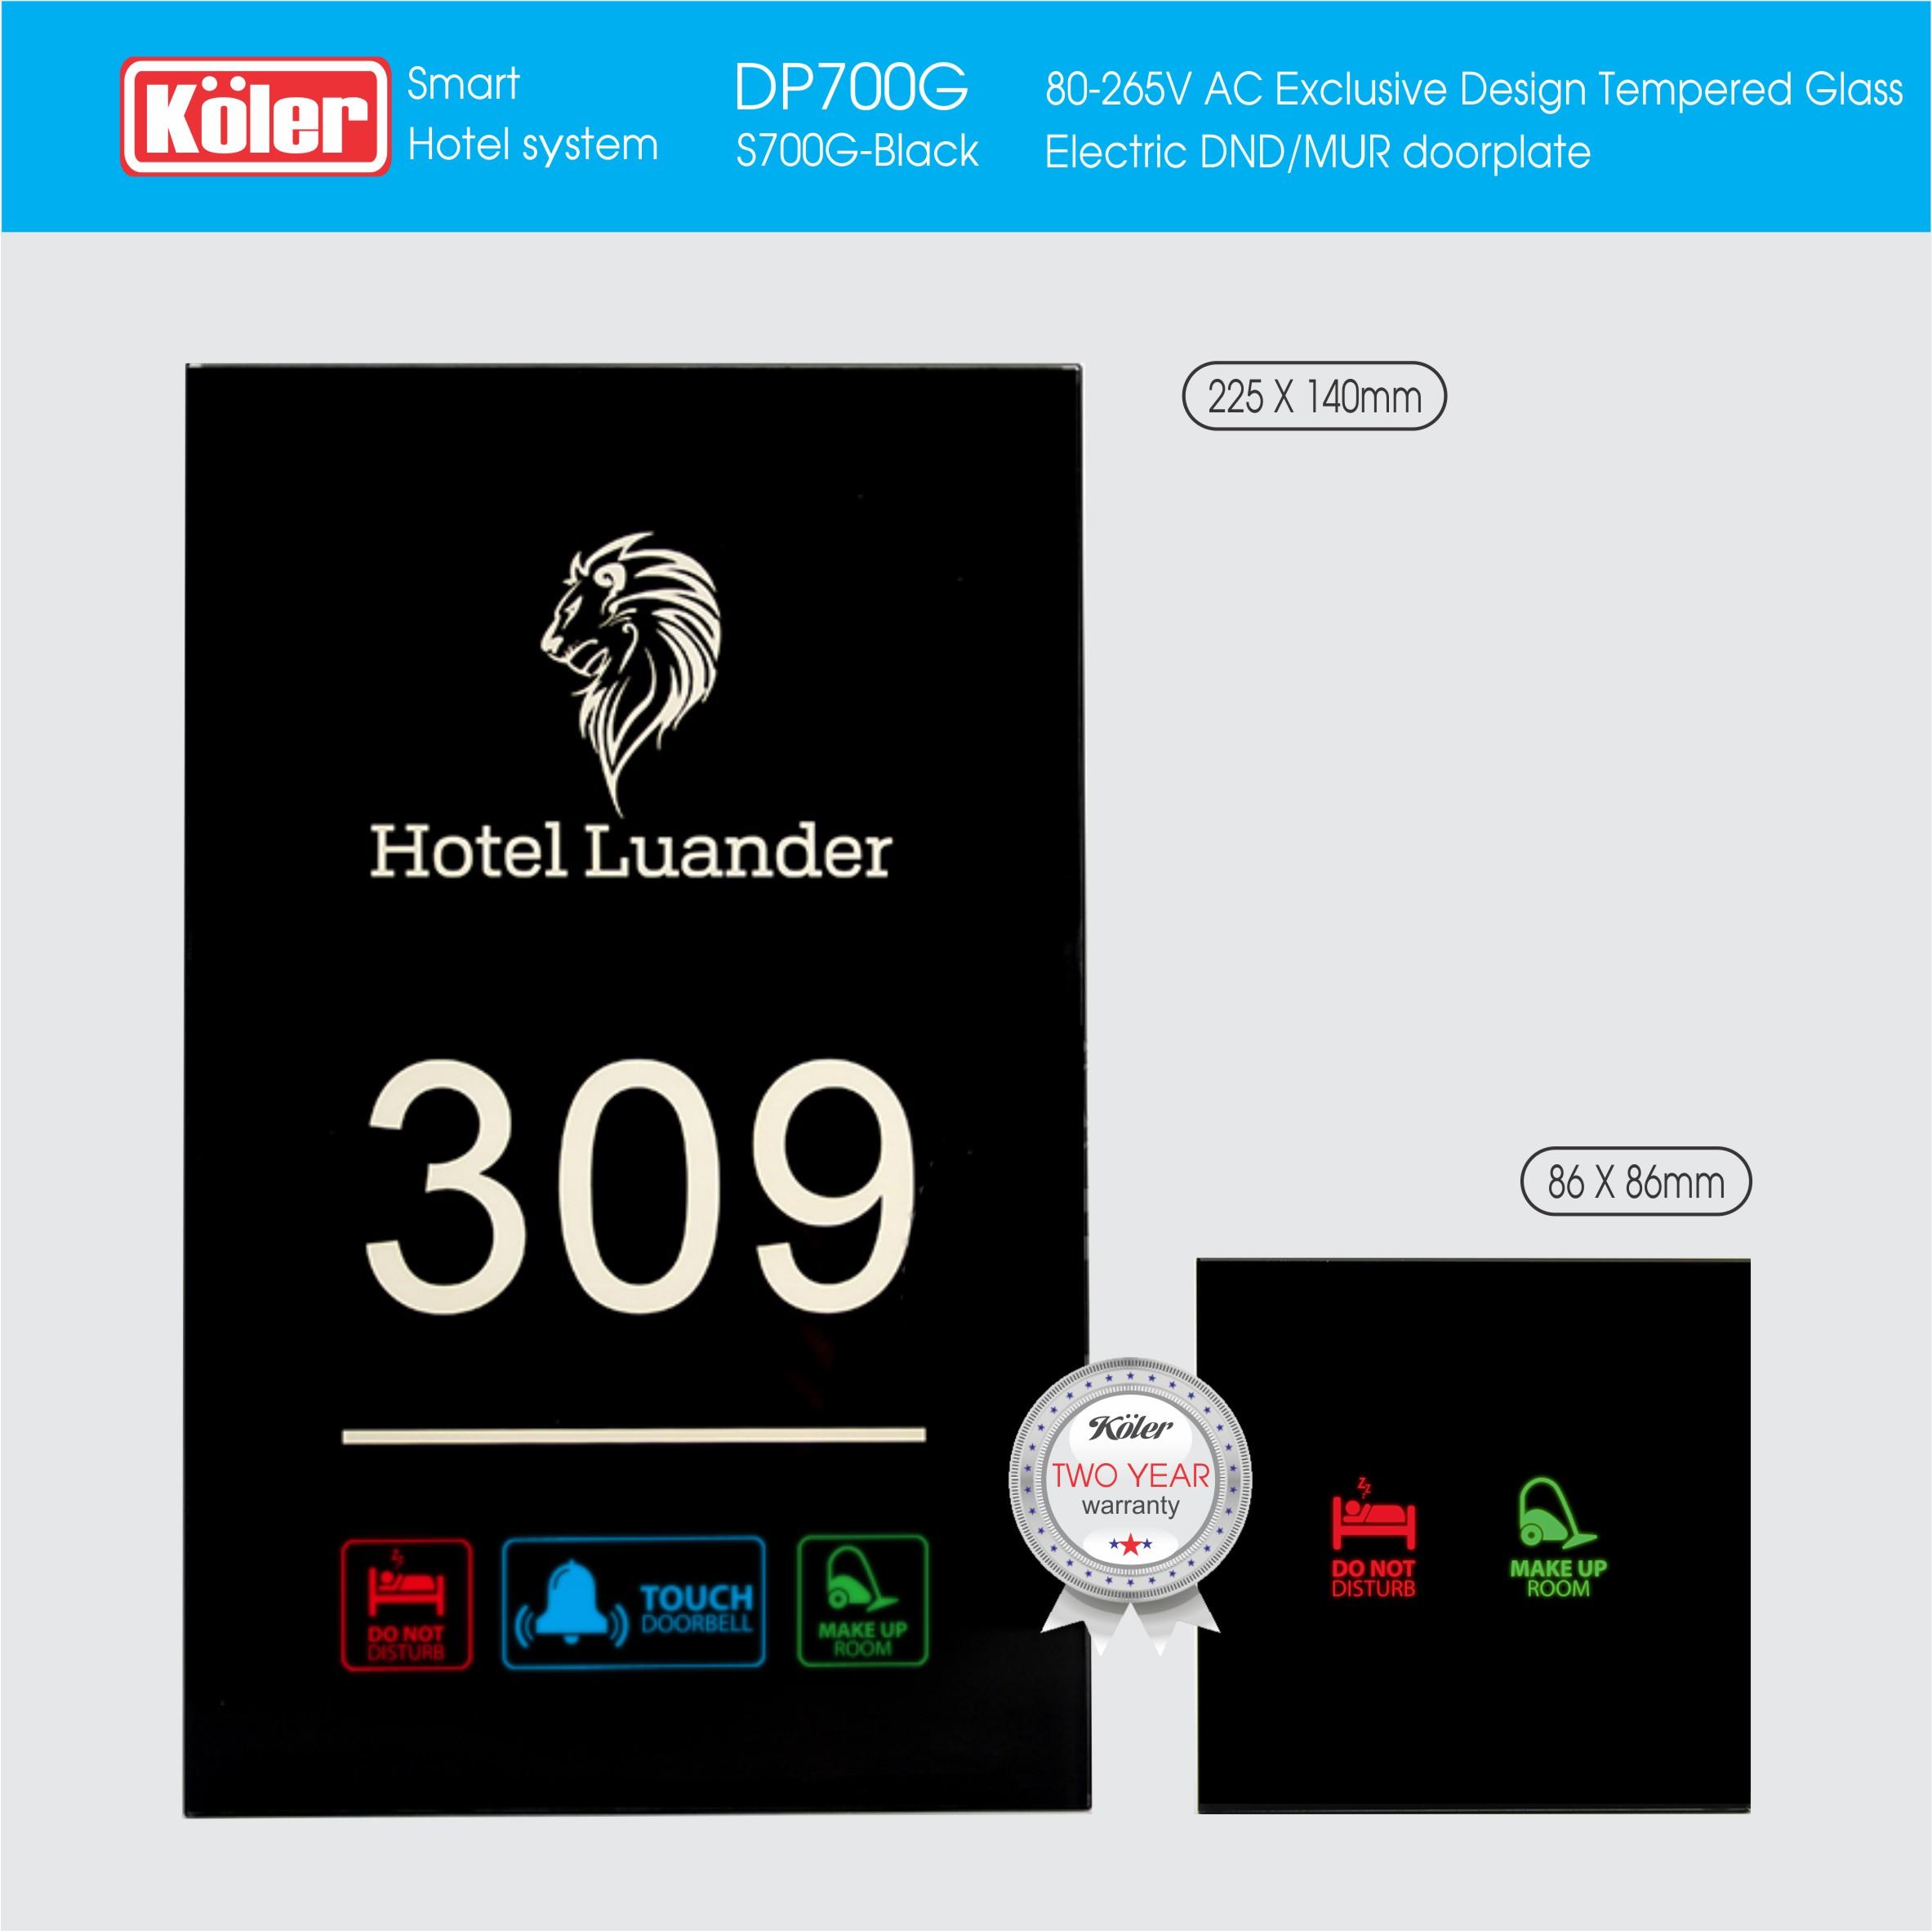 Doorplate Temper Glass LED DP700G Luander